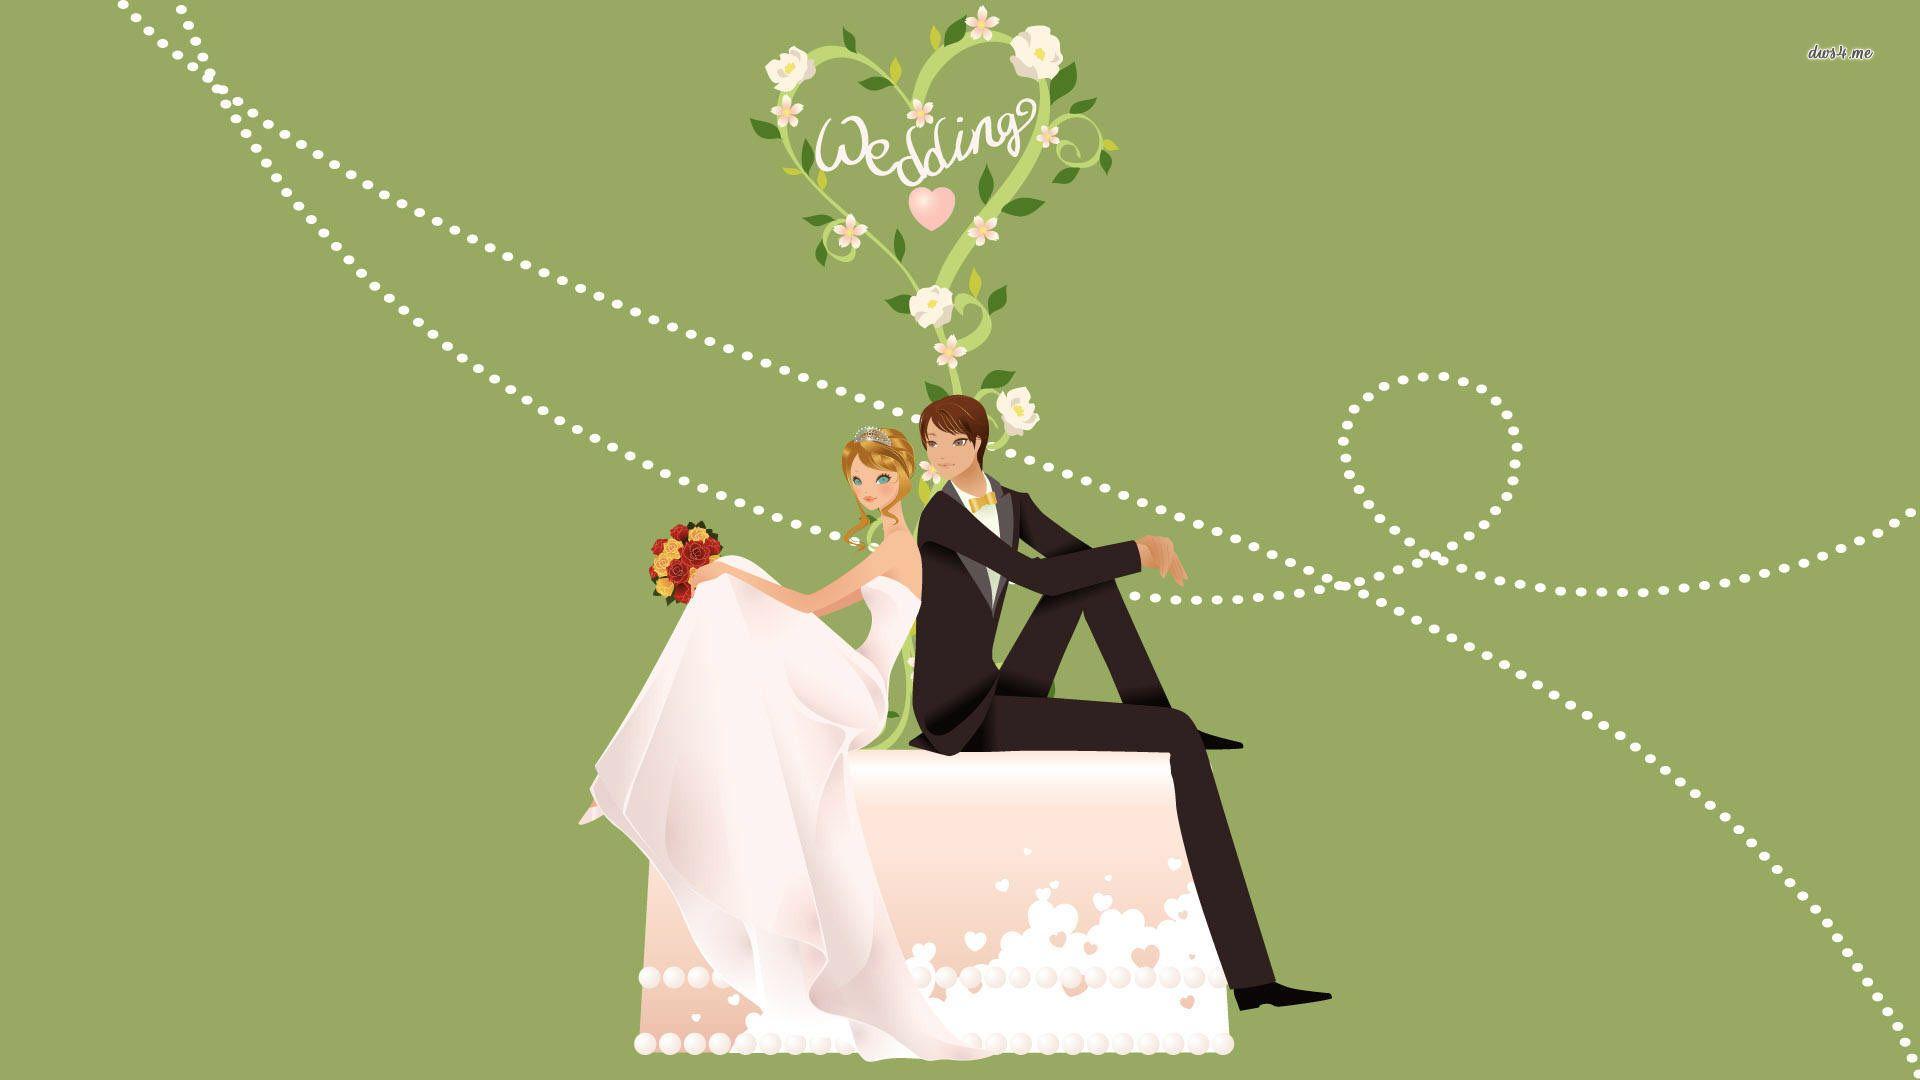 Just Married Couple Hd Wallpaper Man Wallpaper Woman Wallpaper